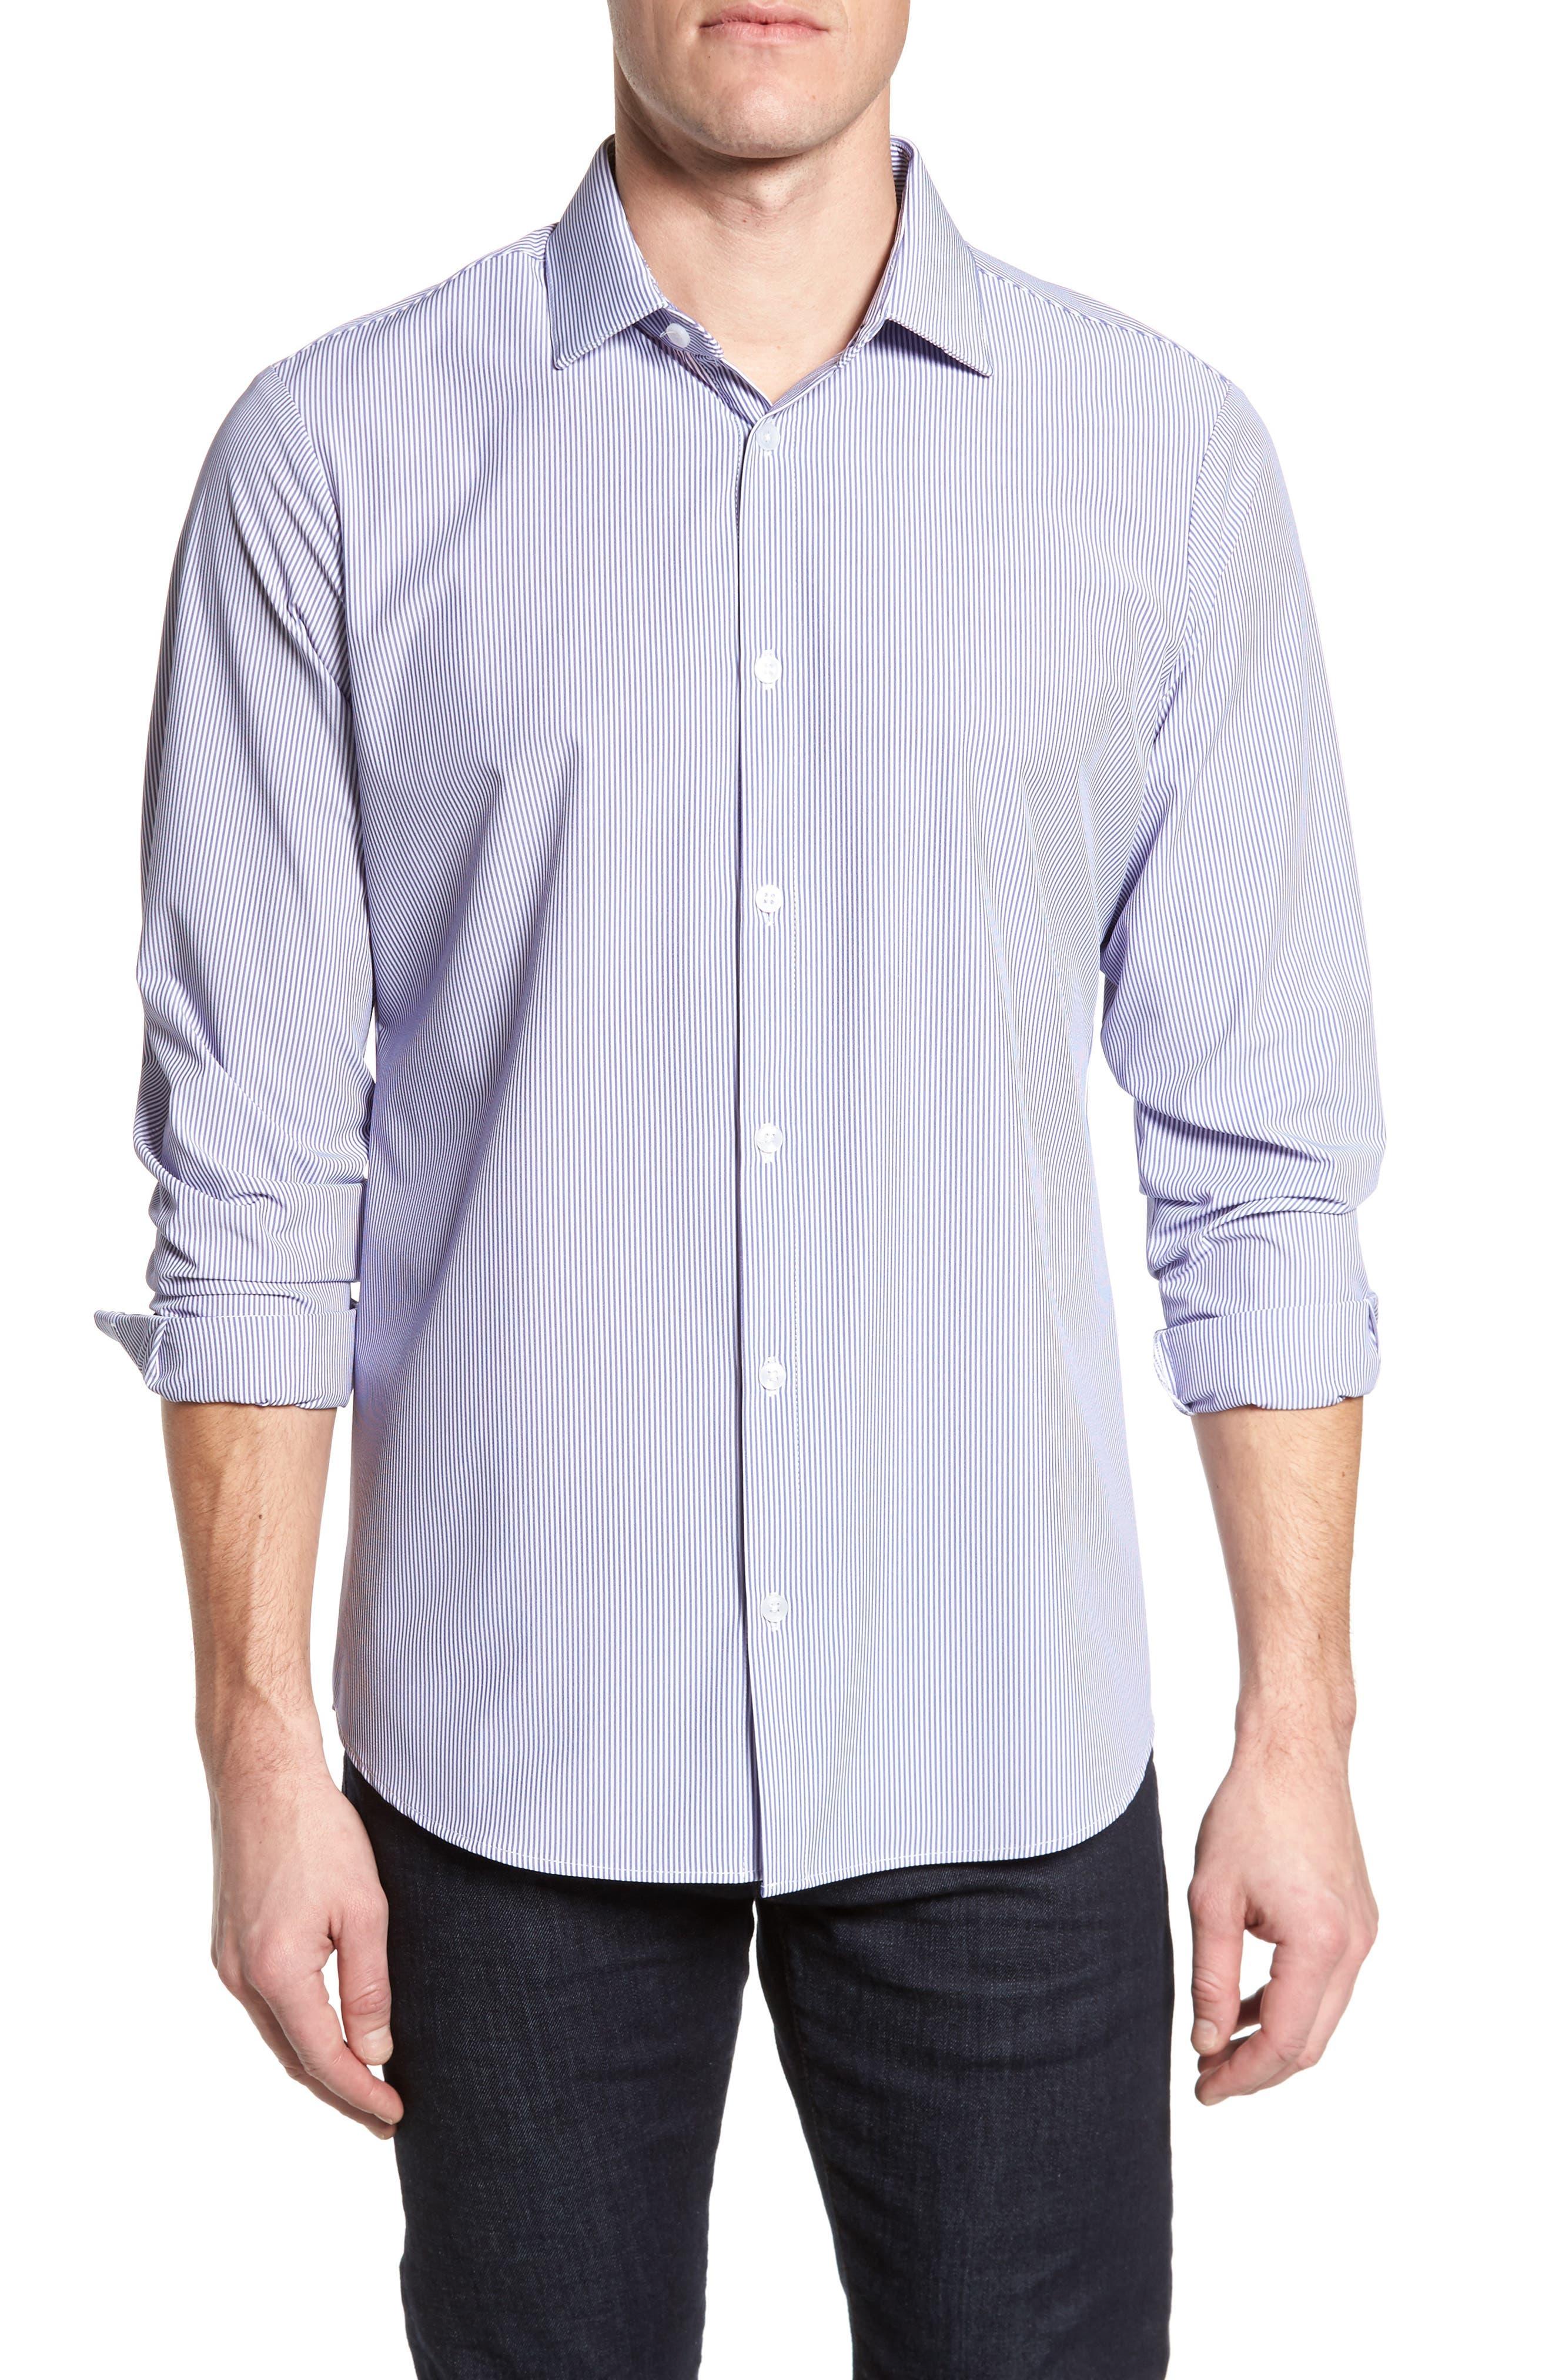 Main Image - Mizzen+Main Newport Pinstripe Sport Shirt